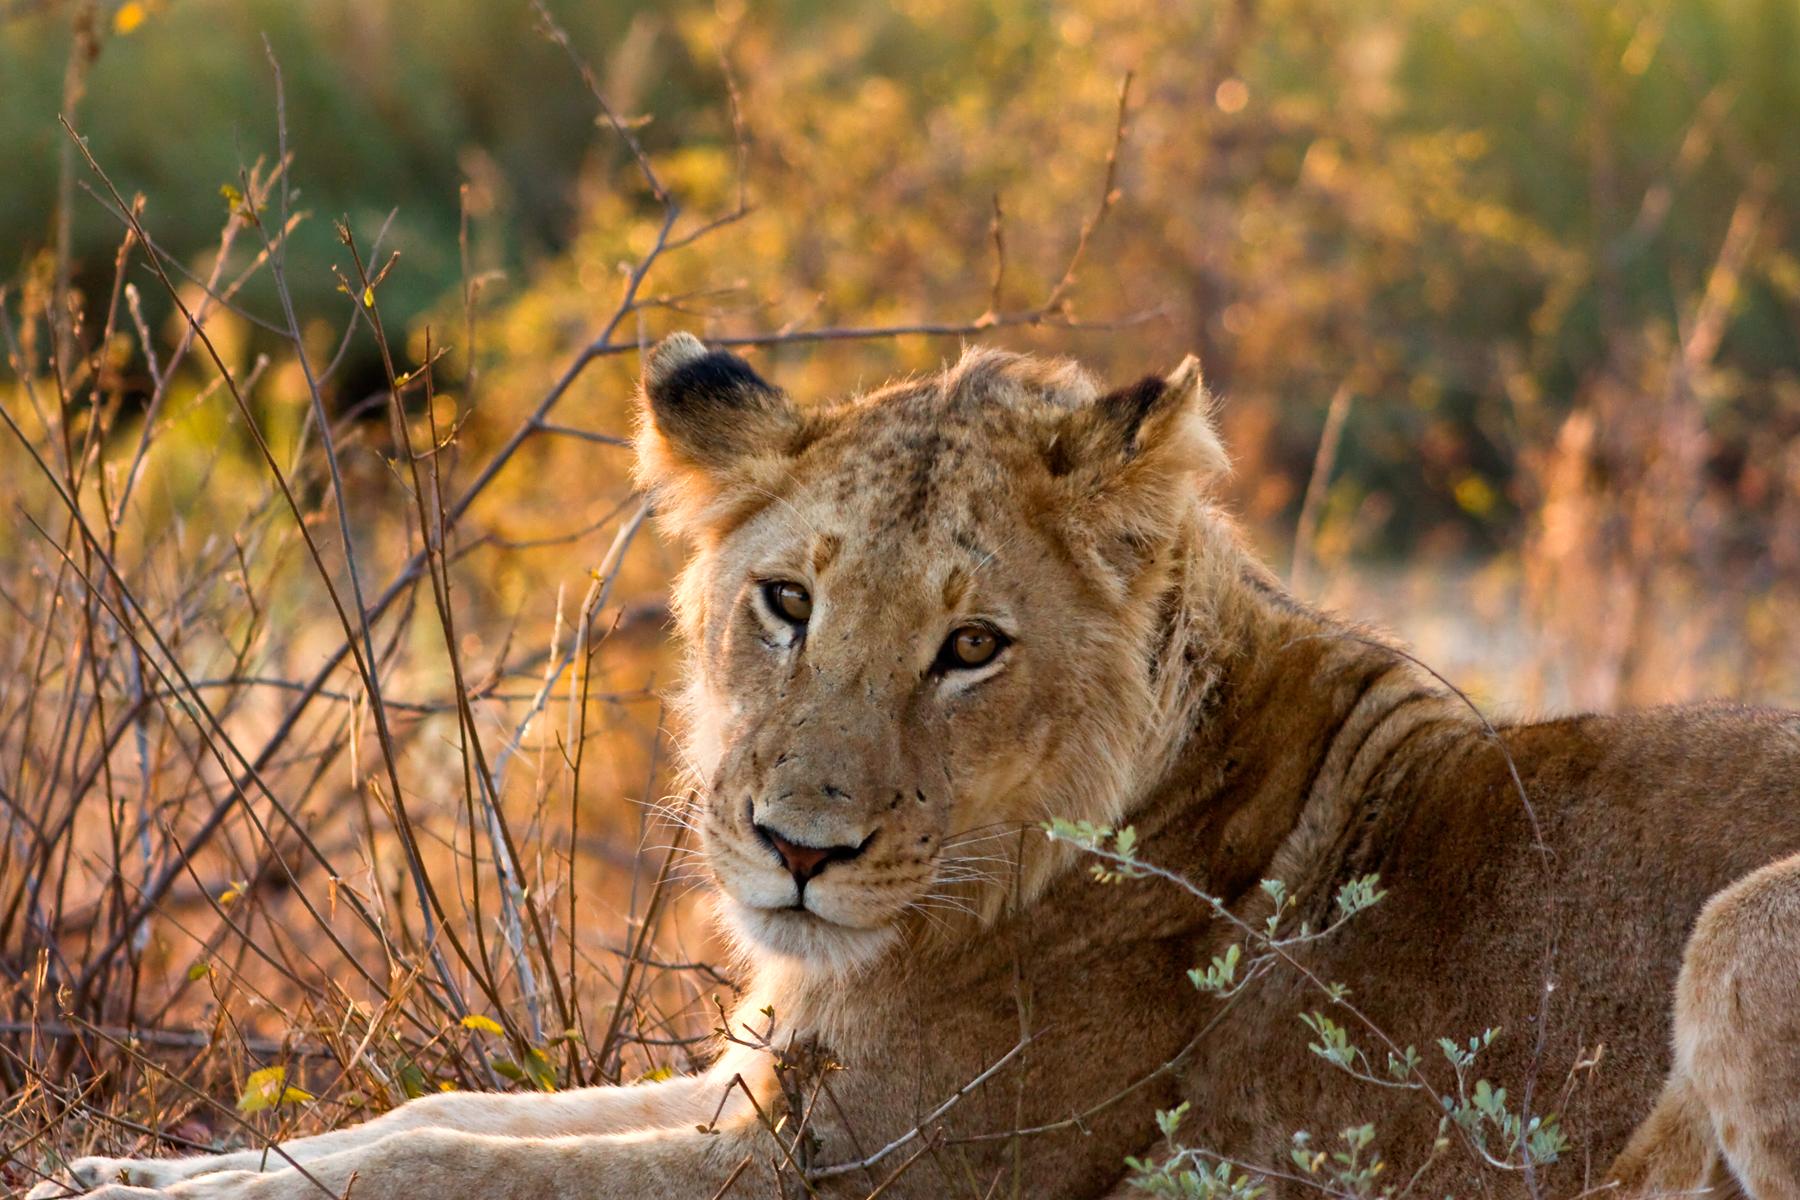 Kruger Park Lioness, Africa, Resource, National, Natural, HQ Photo